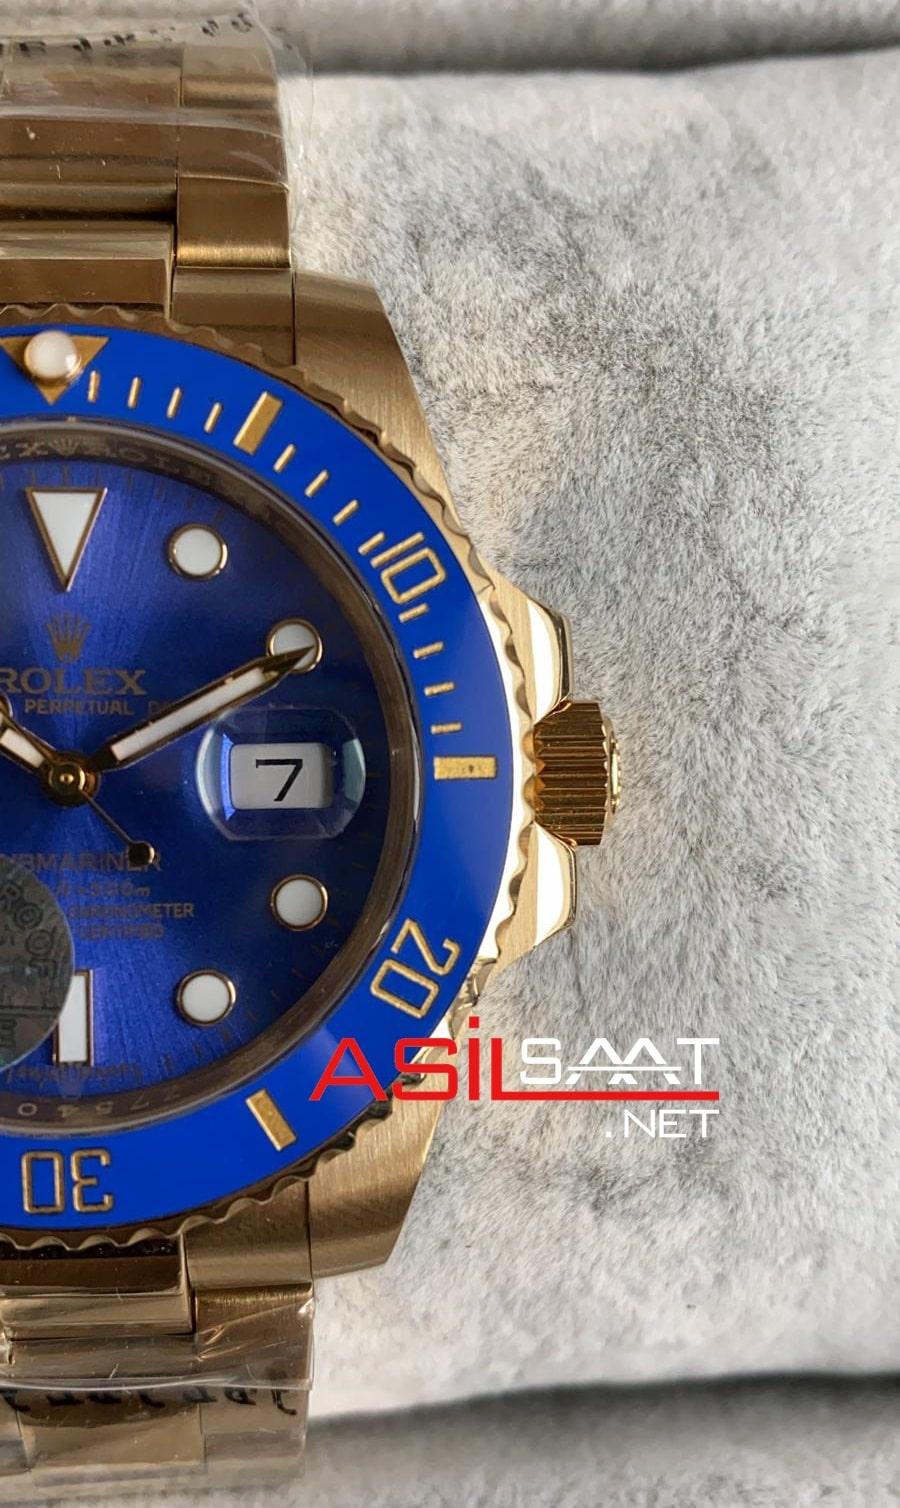 Rolex Oyster Perpetual Submariner Gold Replika Saat ROLS012